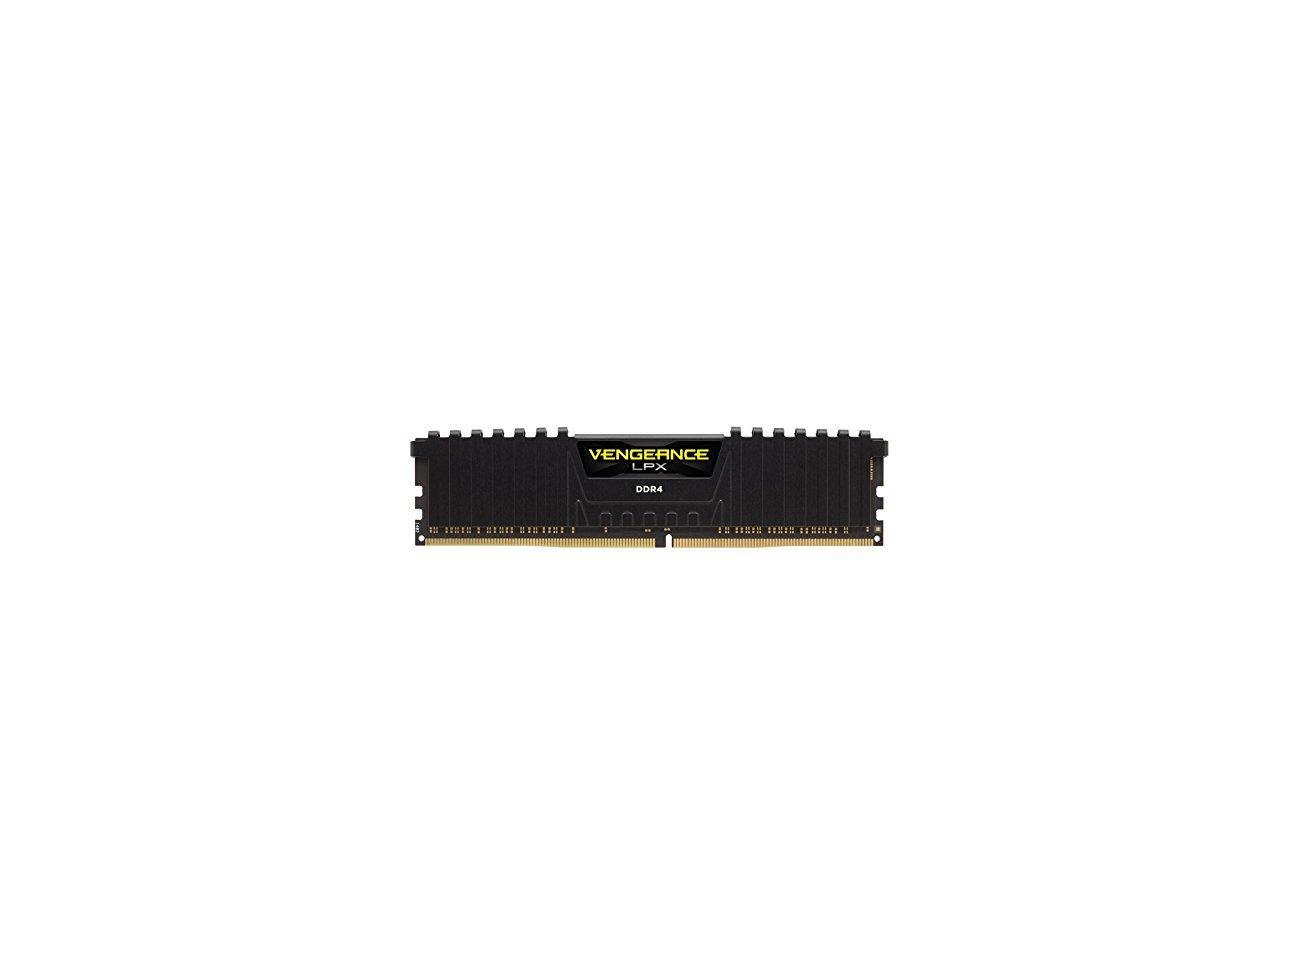 Buy Corsair CMK16GX4M2B3000C15 Vengeance LPX 16 GB (2 x 8 GB